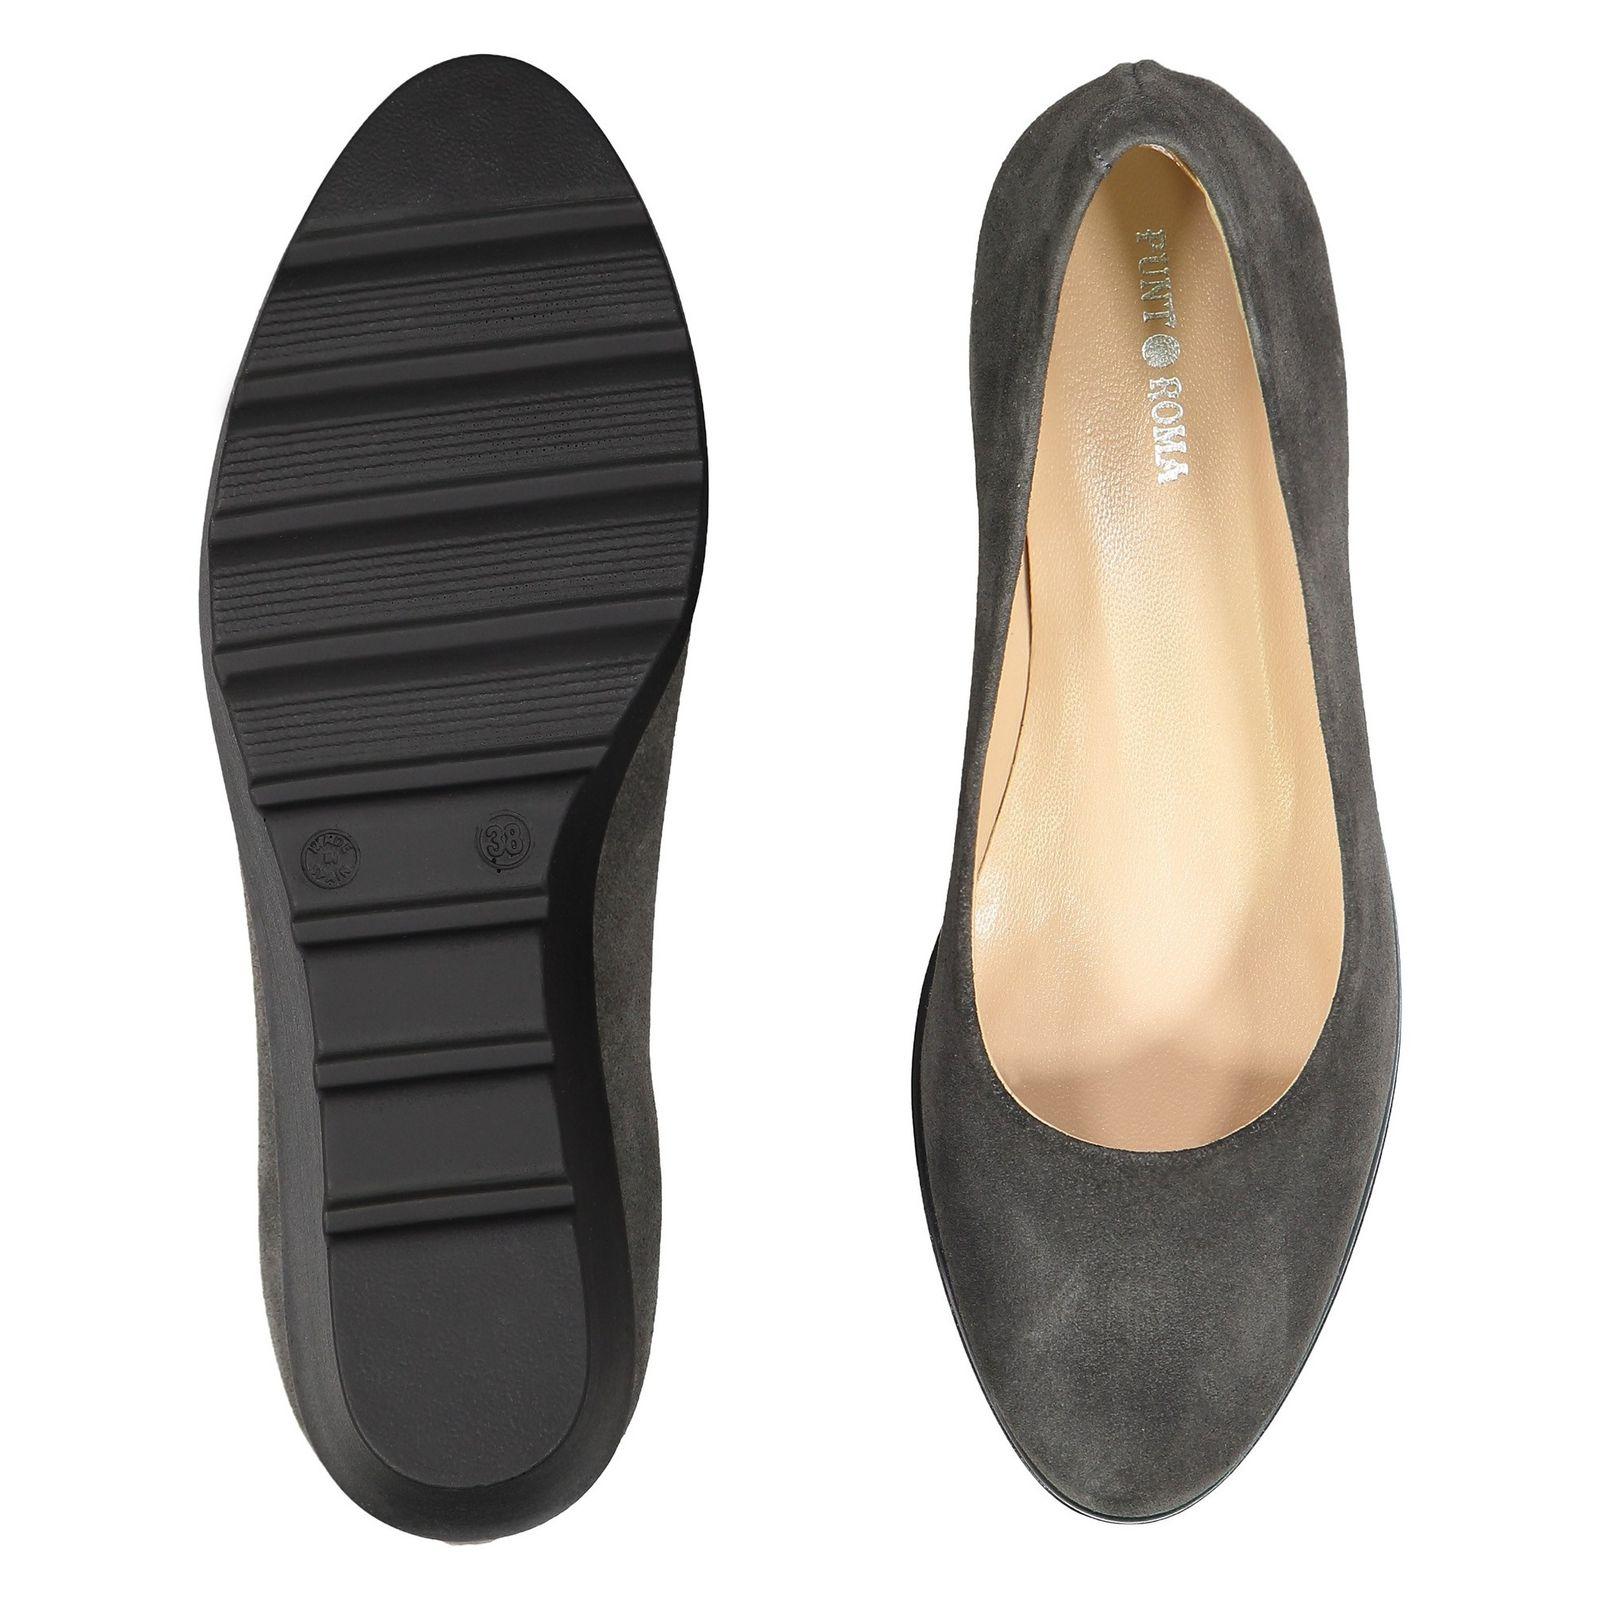 کفش جیر لژ دار چرم زنانه - پونت روما - طوسي - 2